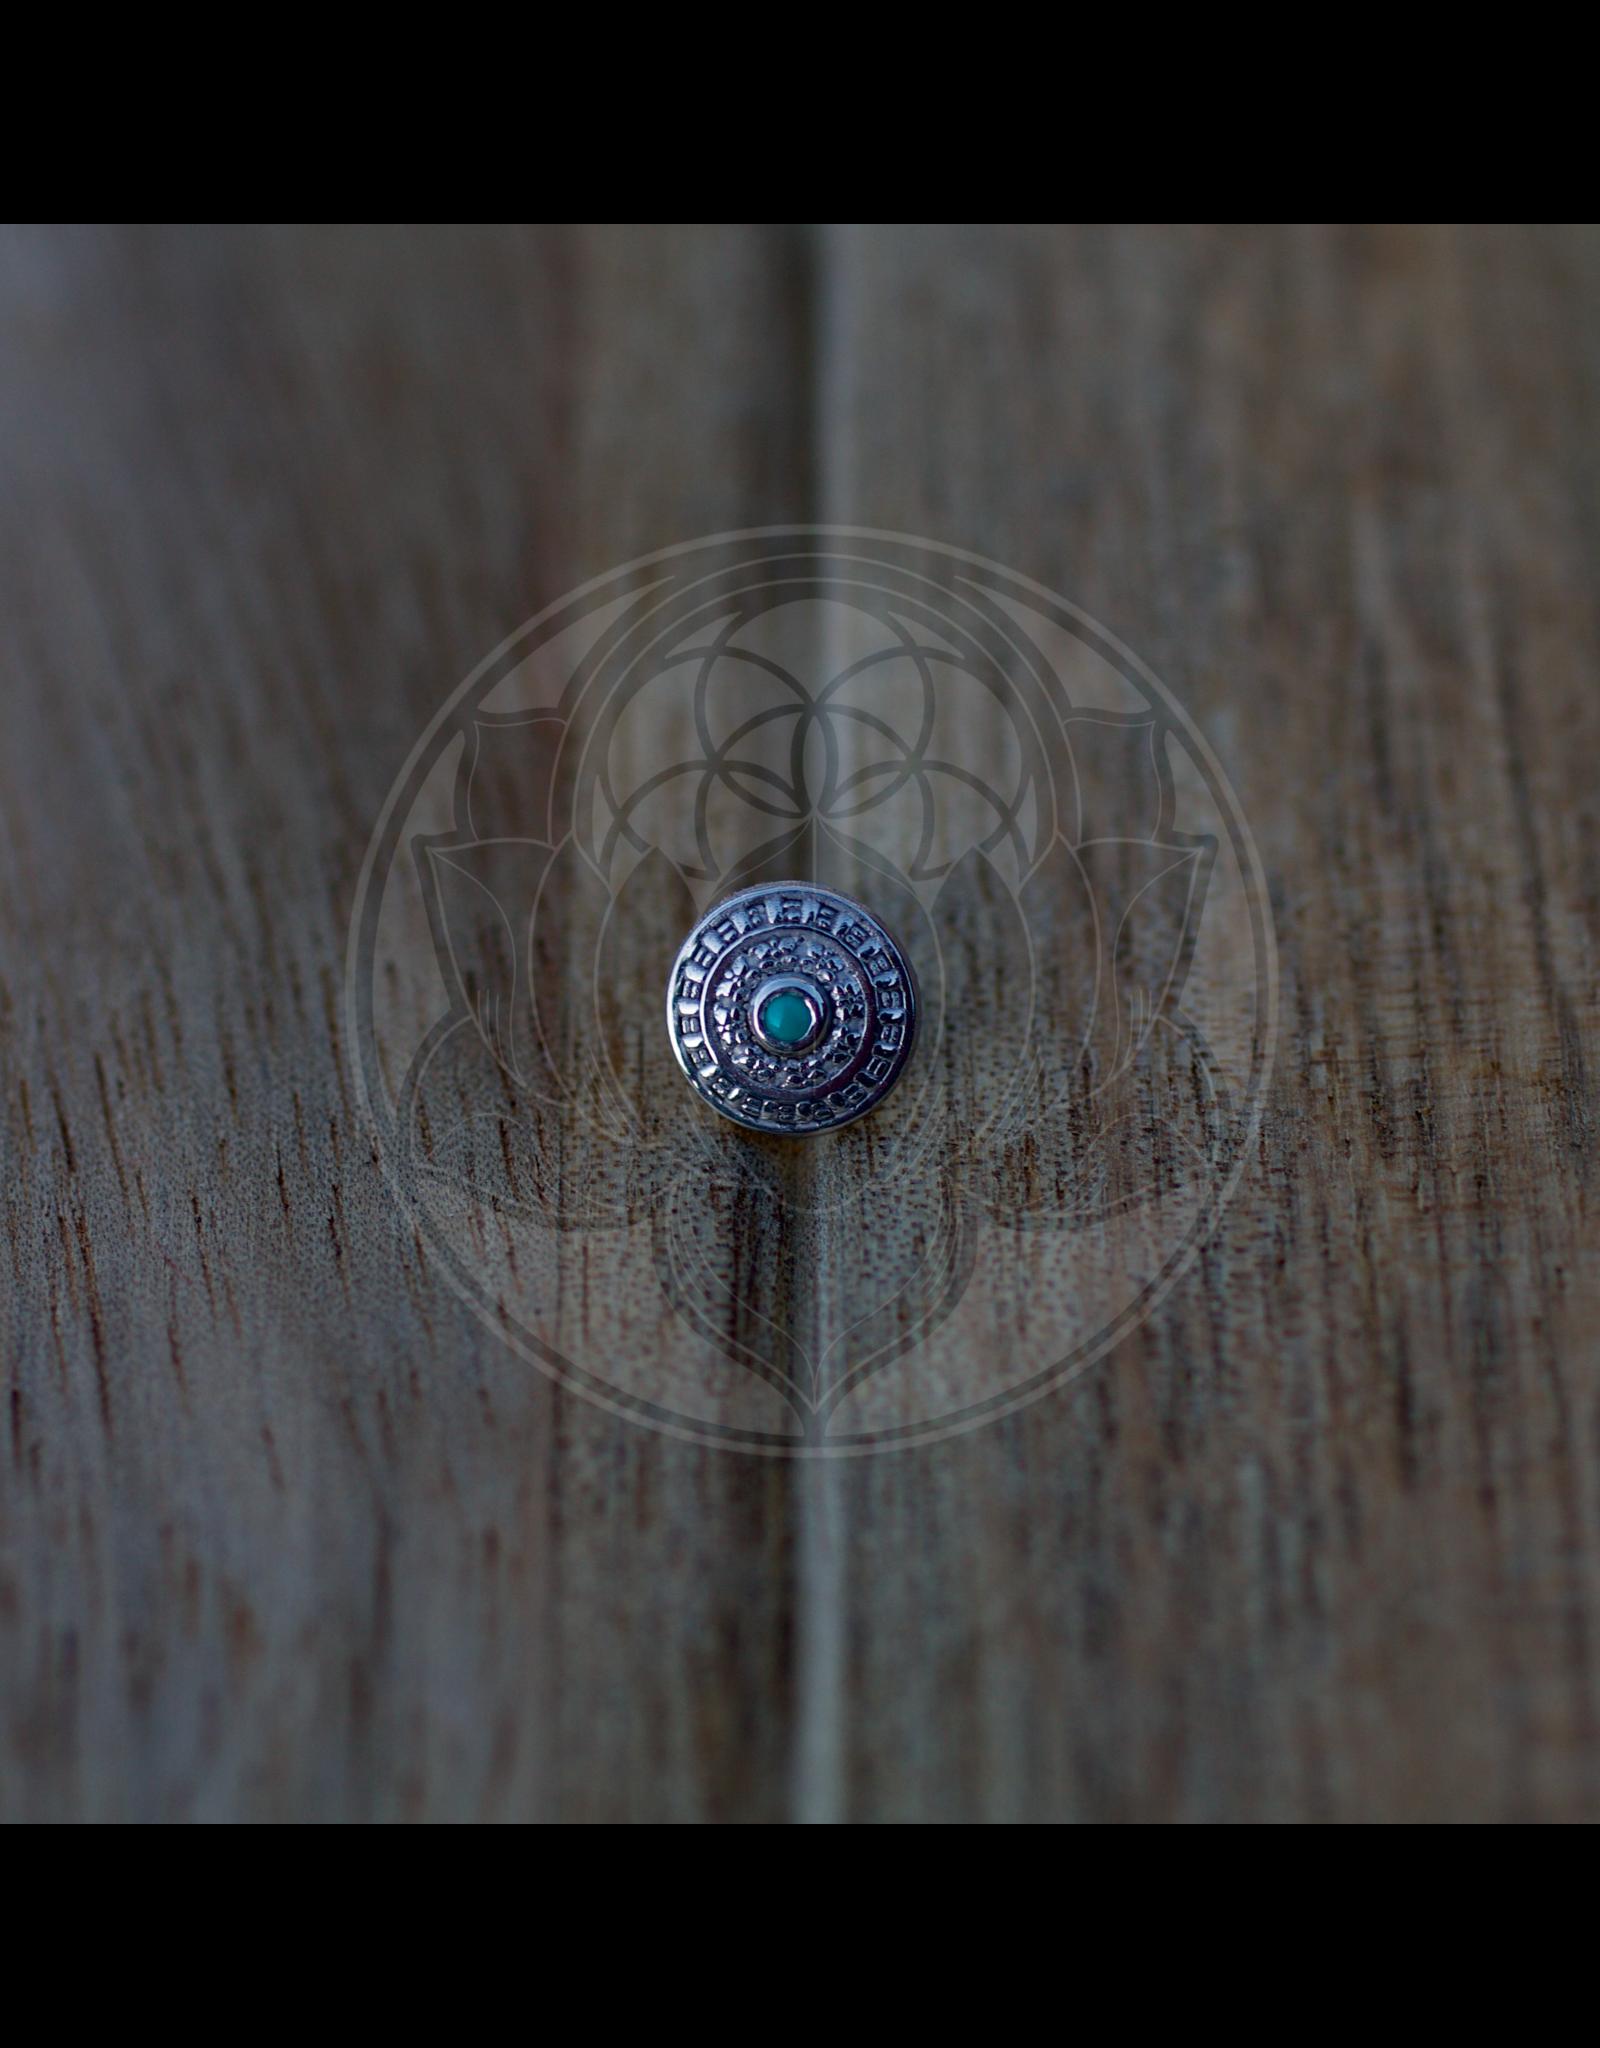 14k WG Relic 1.5mm (6.85mm) Threadless Pin